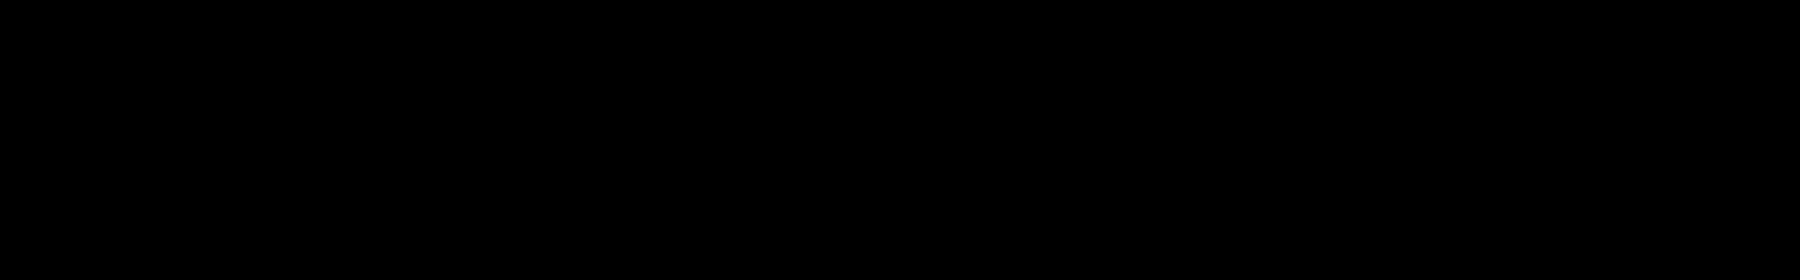 Filmwig audio waveform